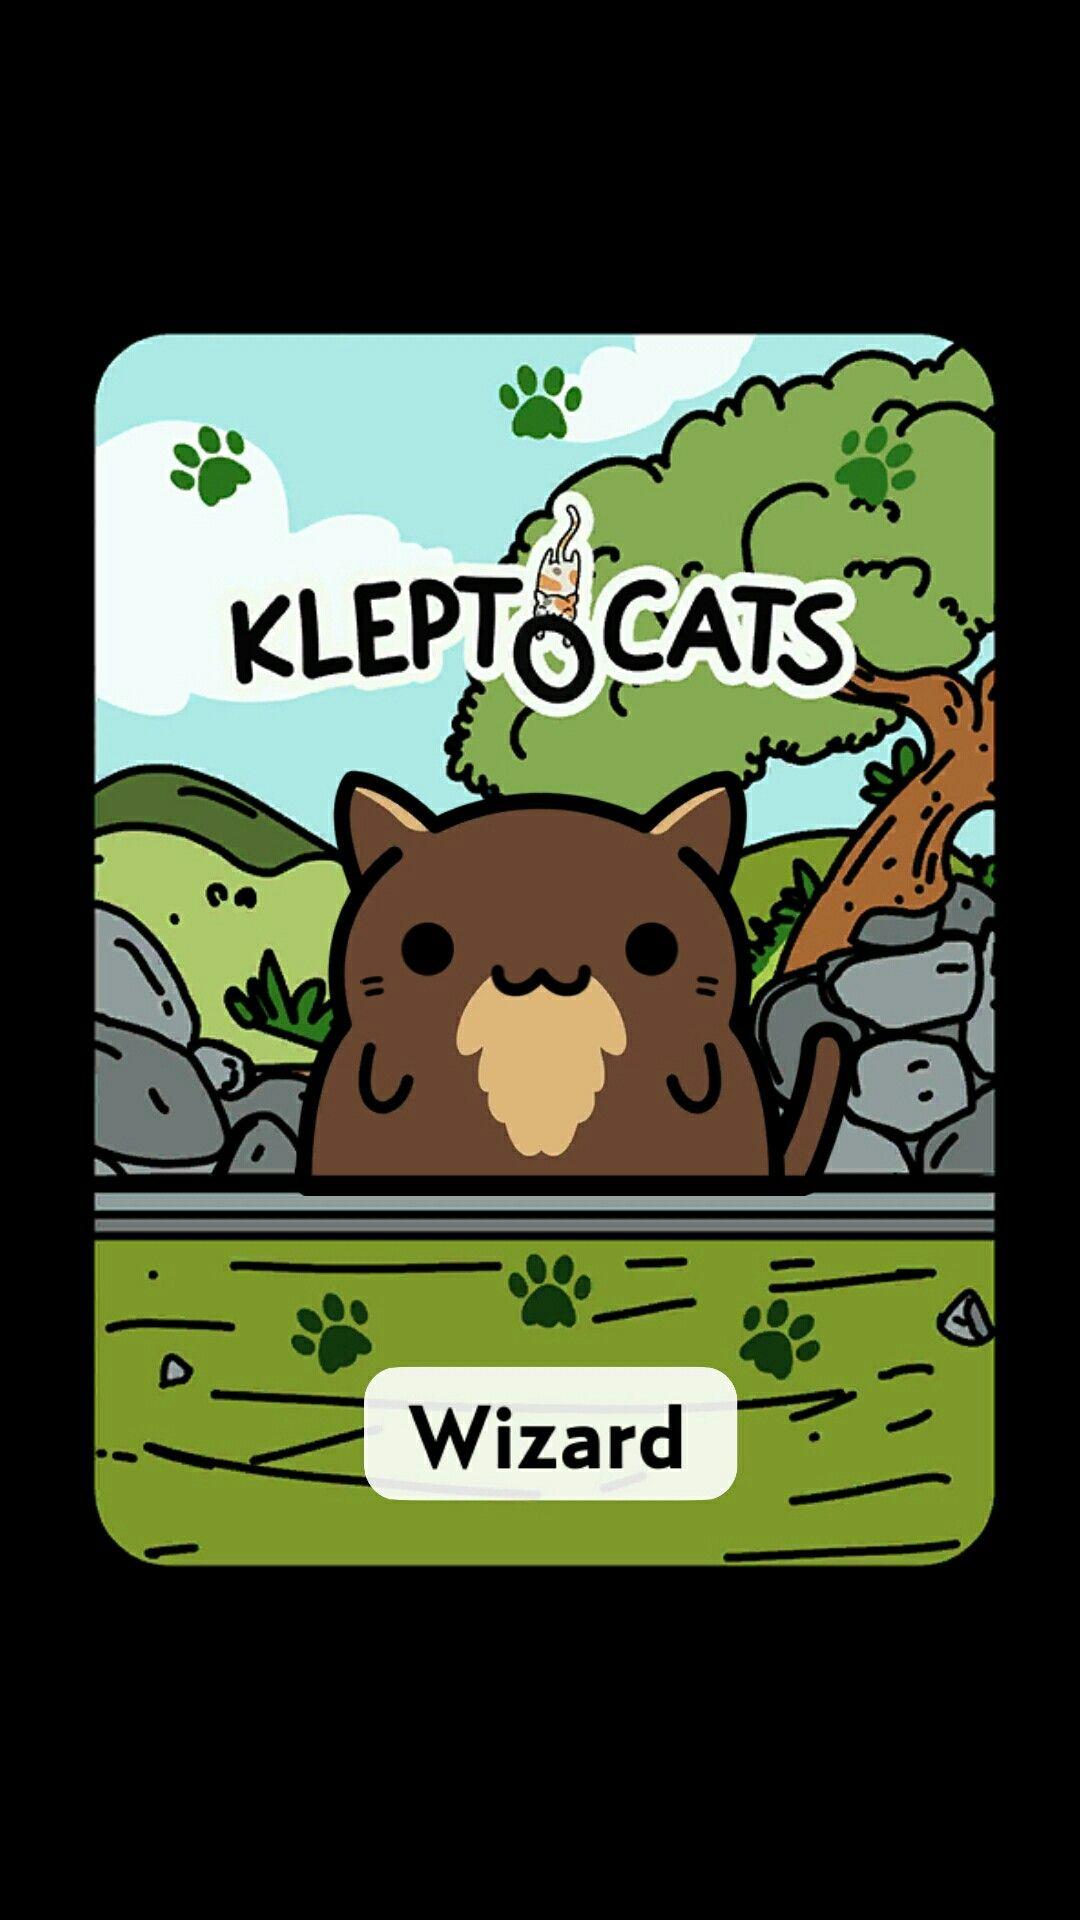 Pin by Sheneil Shirley on KLEPTOCATS Crazy cats, Klepto